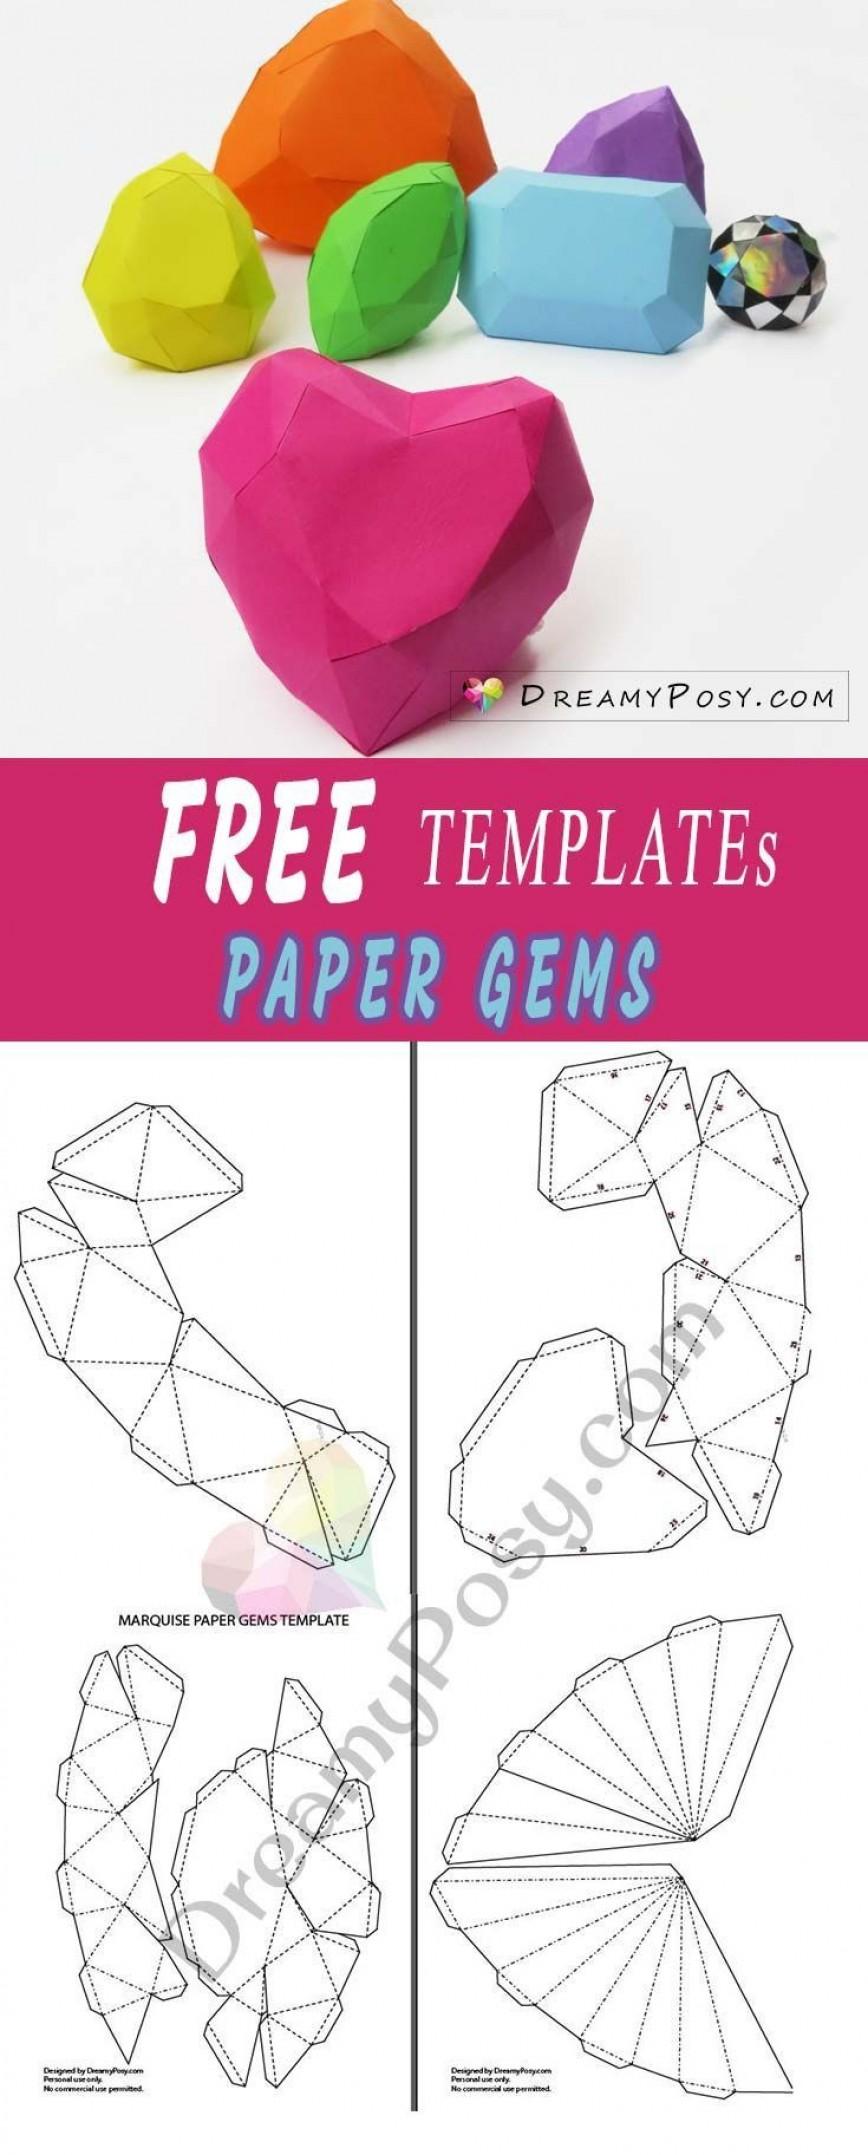 003 Magnificent 3d Paper Art Template Inspiration  Templates Pdf Free